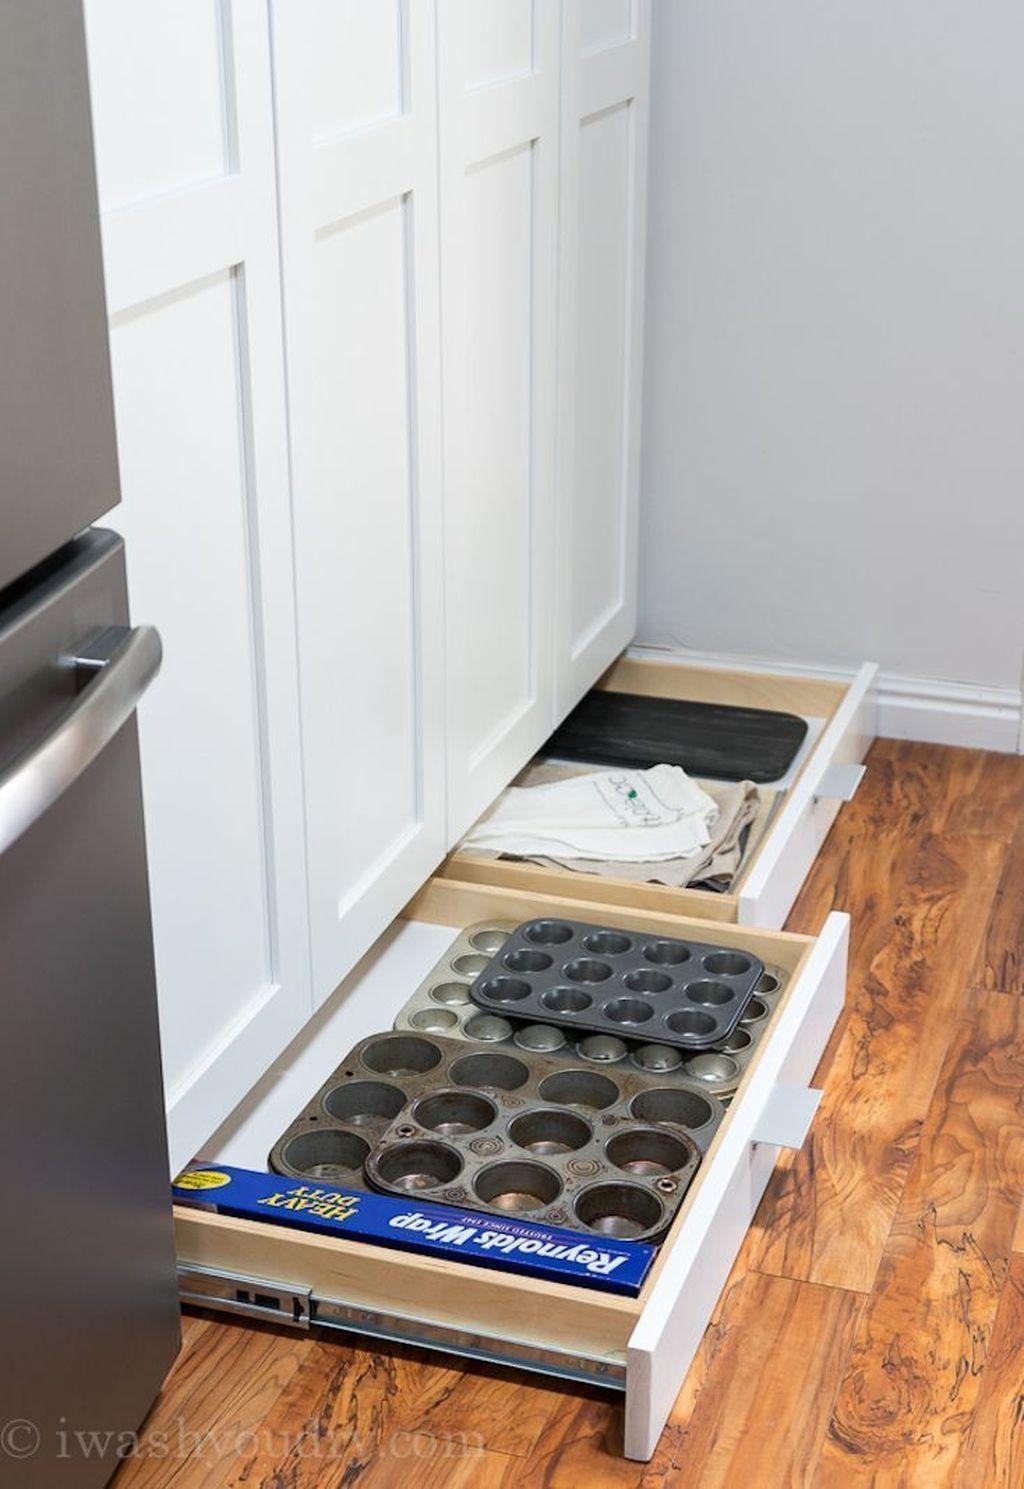 49 Best Diy Kitchen Storage Ideas For More Space In The Kitchen